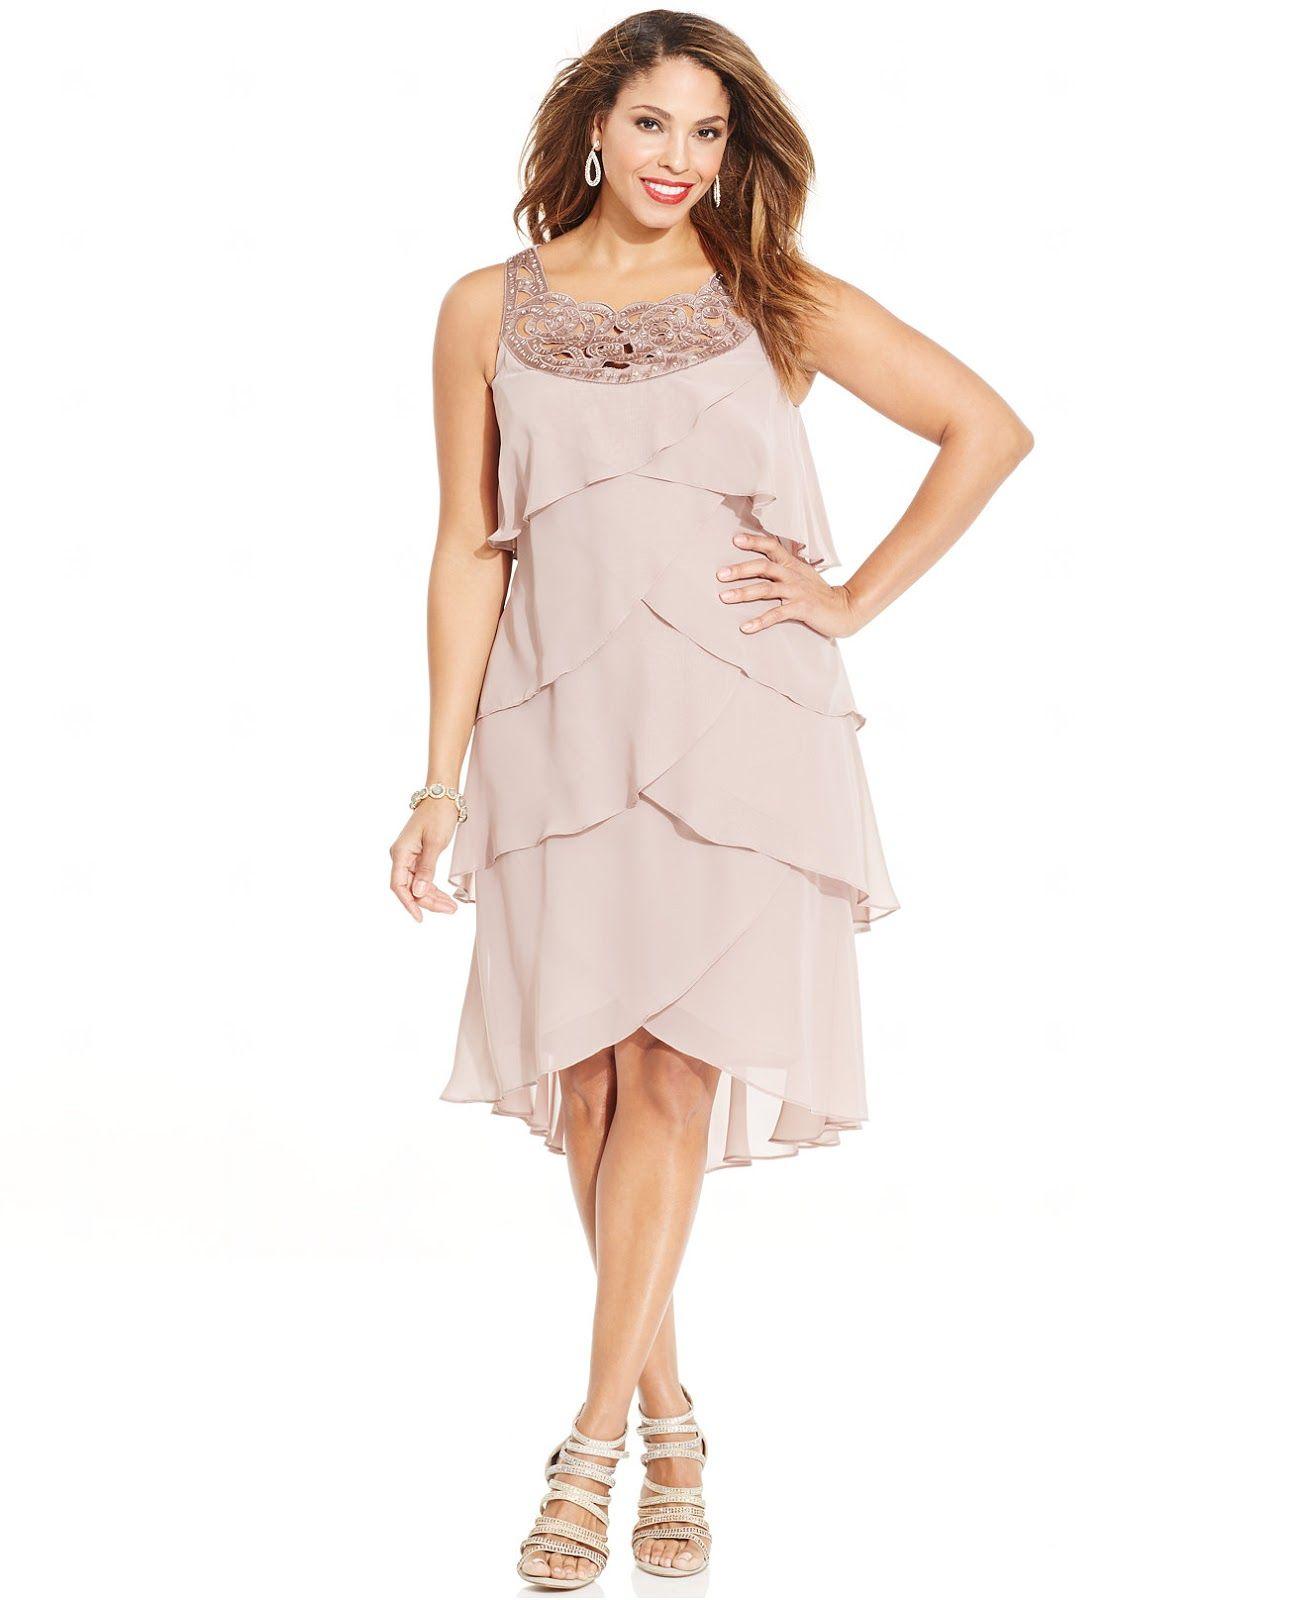 Vestidos+para+gorditas+%282%29.jpg (1307×1600) | vestido | Pinterest